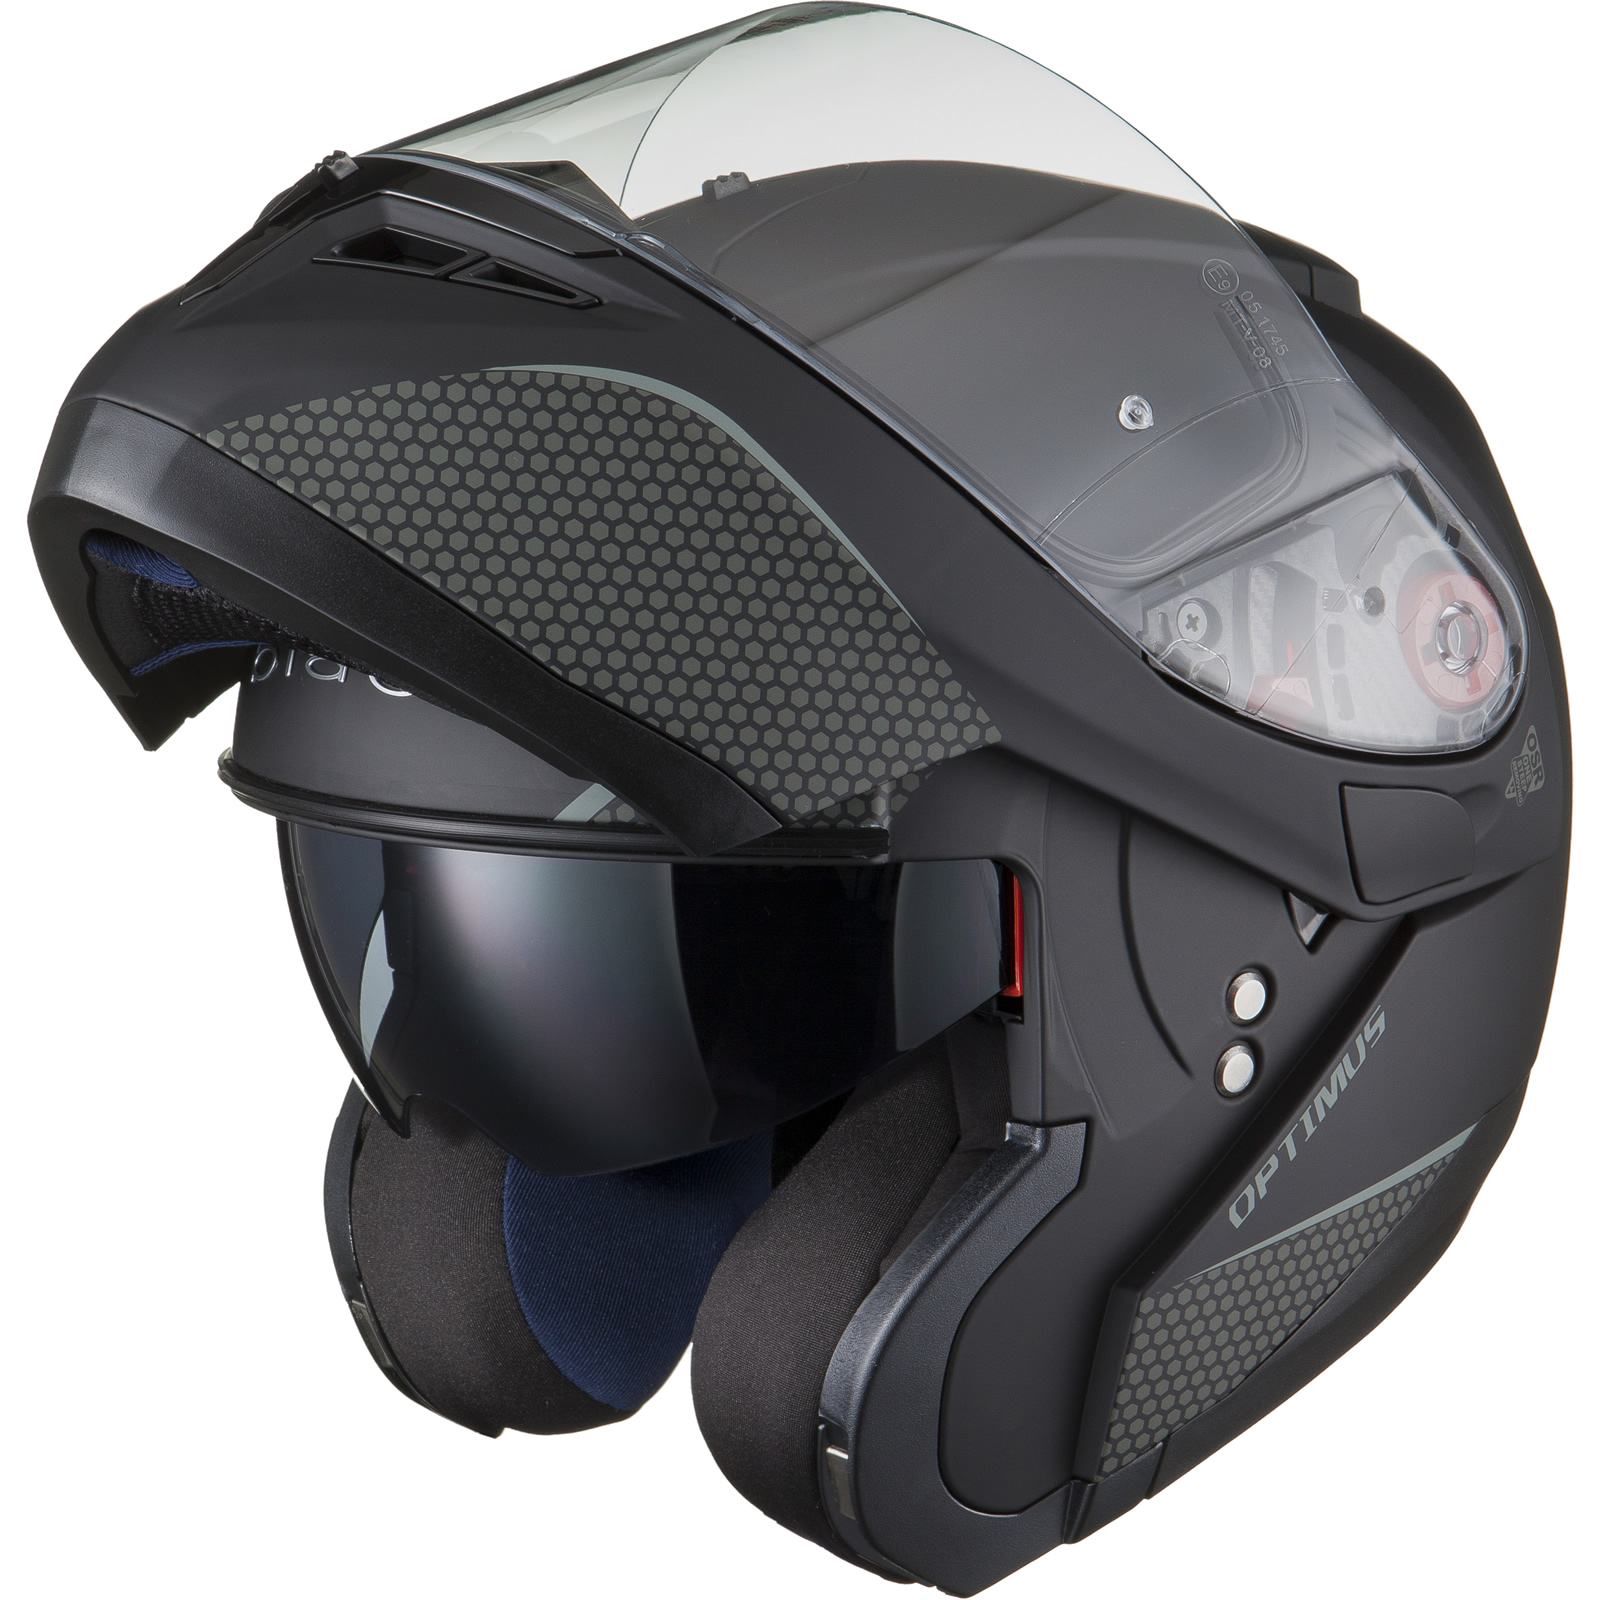 Black-Optimus-SV-Max-Vision-Flip-Up-Front-Motorcycle-Helmet-Pinlock-Ready-Visor thumbnail 24